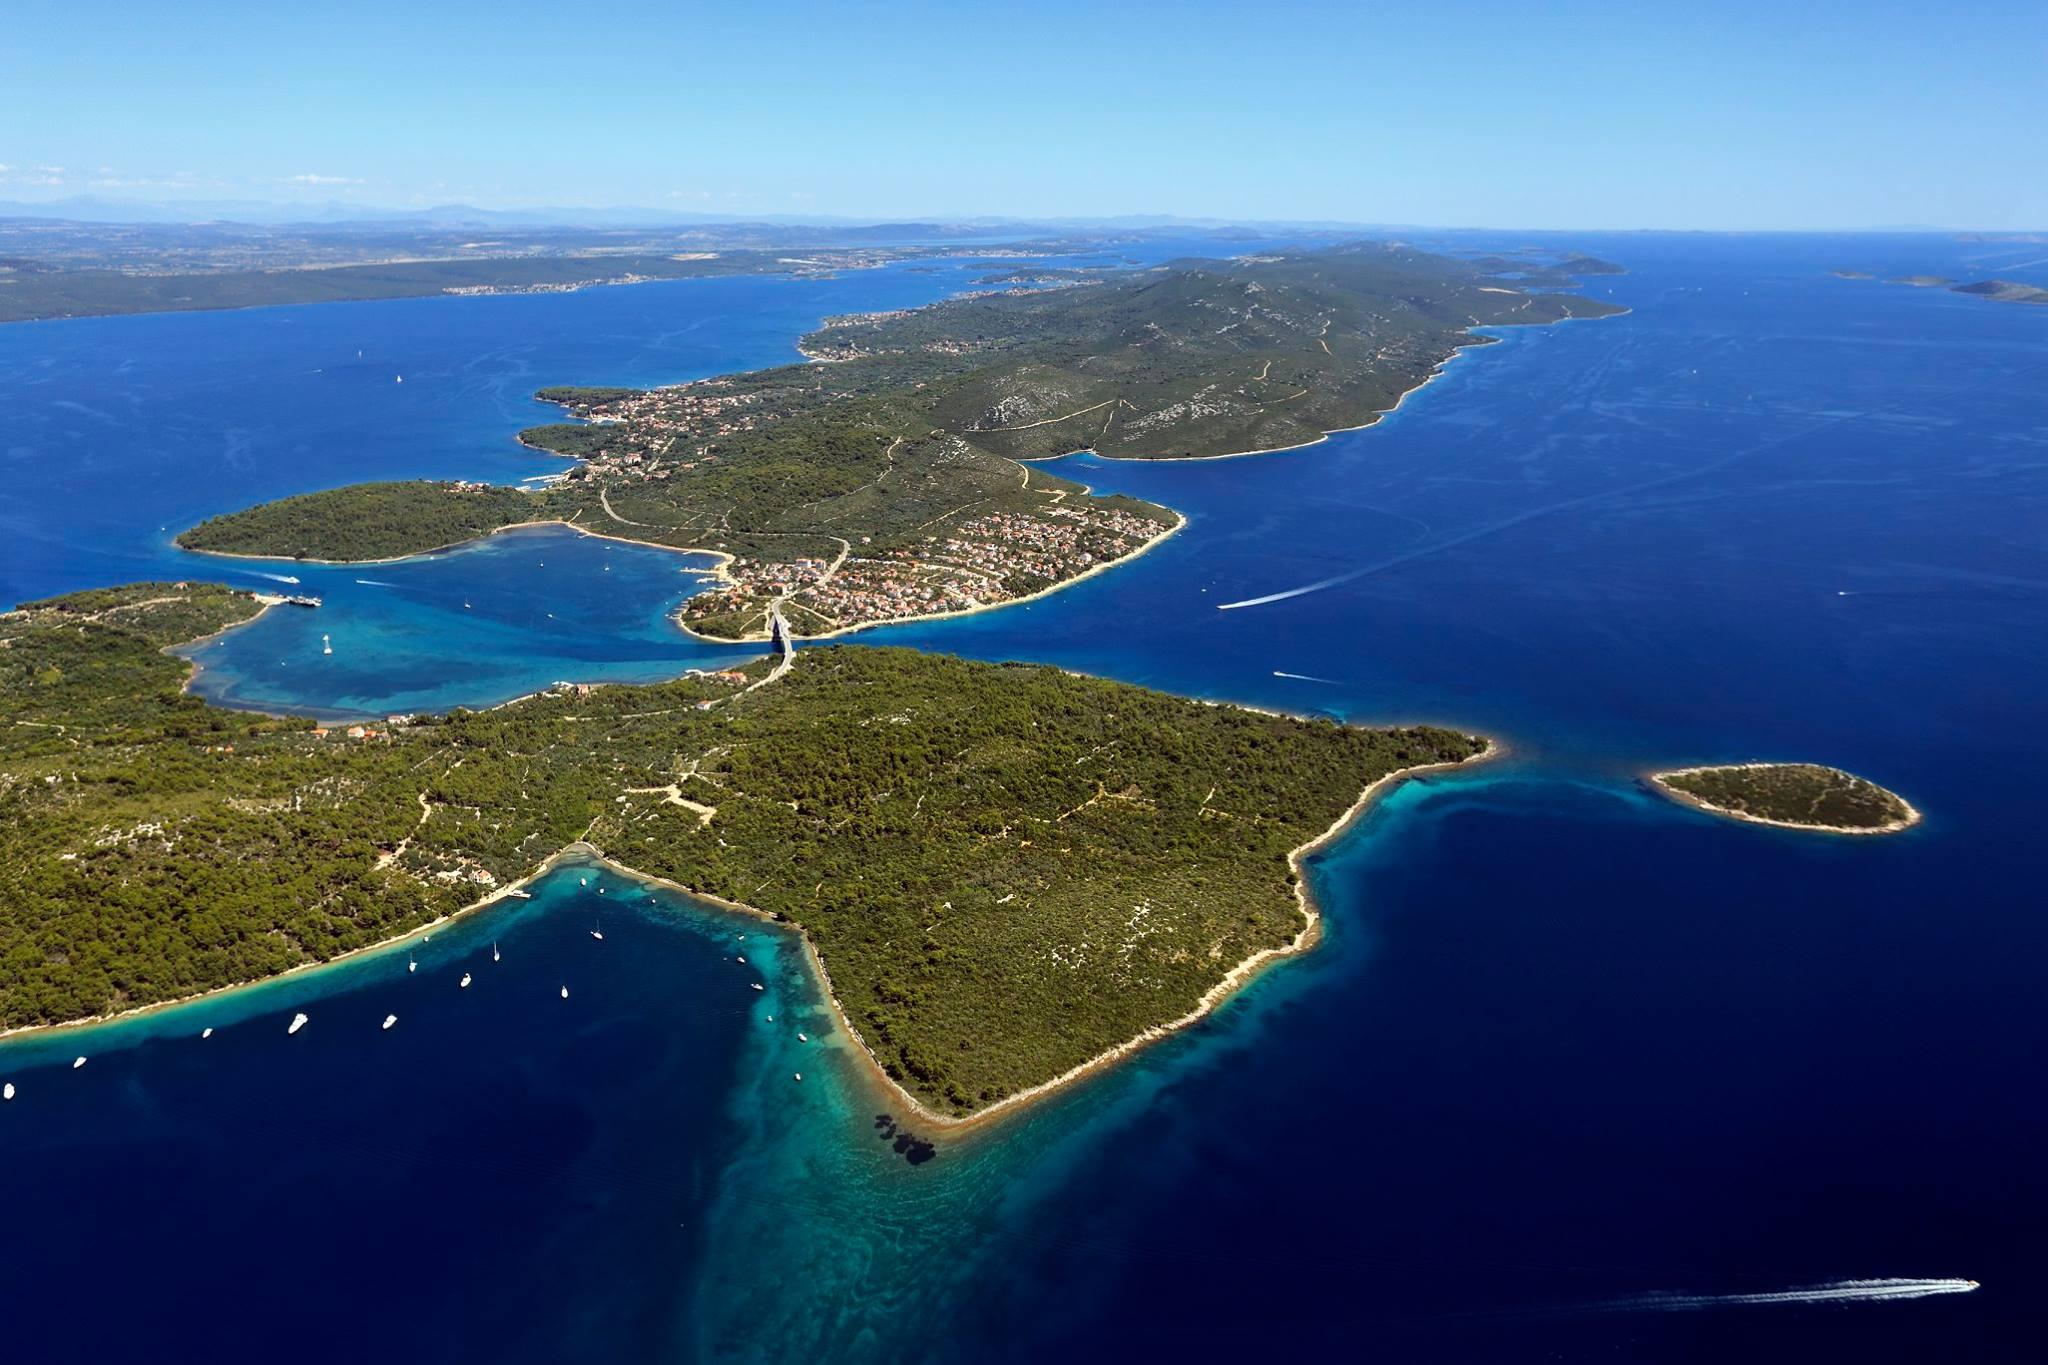 PASMAN ISLAND, ZADAR REGION